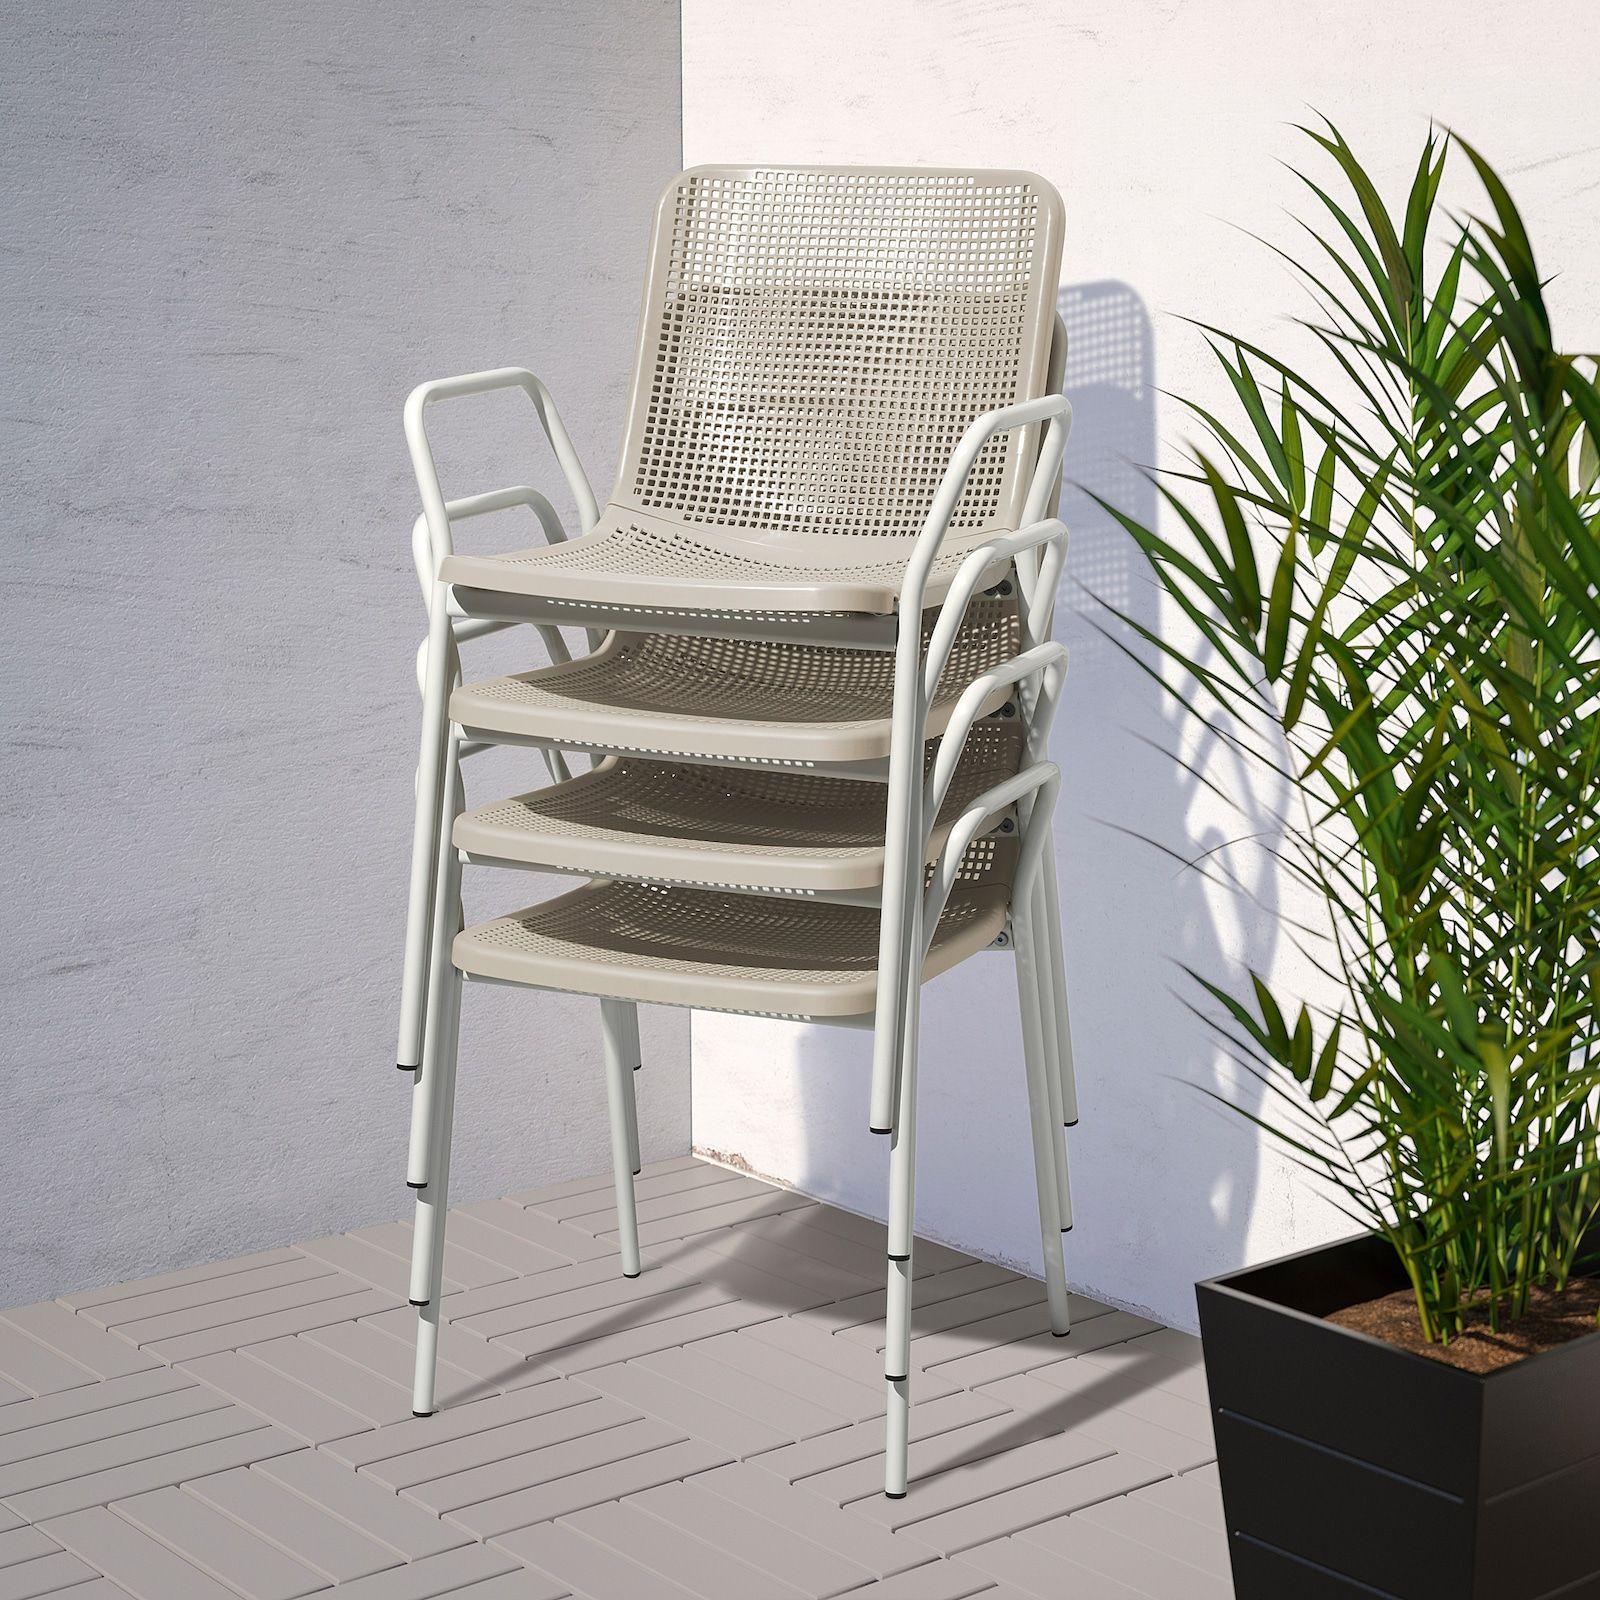 Torparo Armchair In Outdoor White Beige Ikea In 2021 Outdoor Dining Furniture Outdoor Dining Chairs Outdoor Furniture